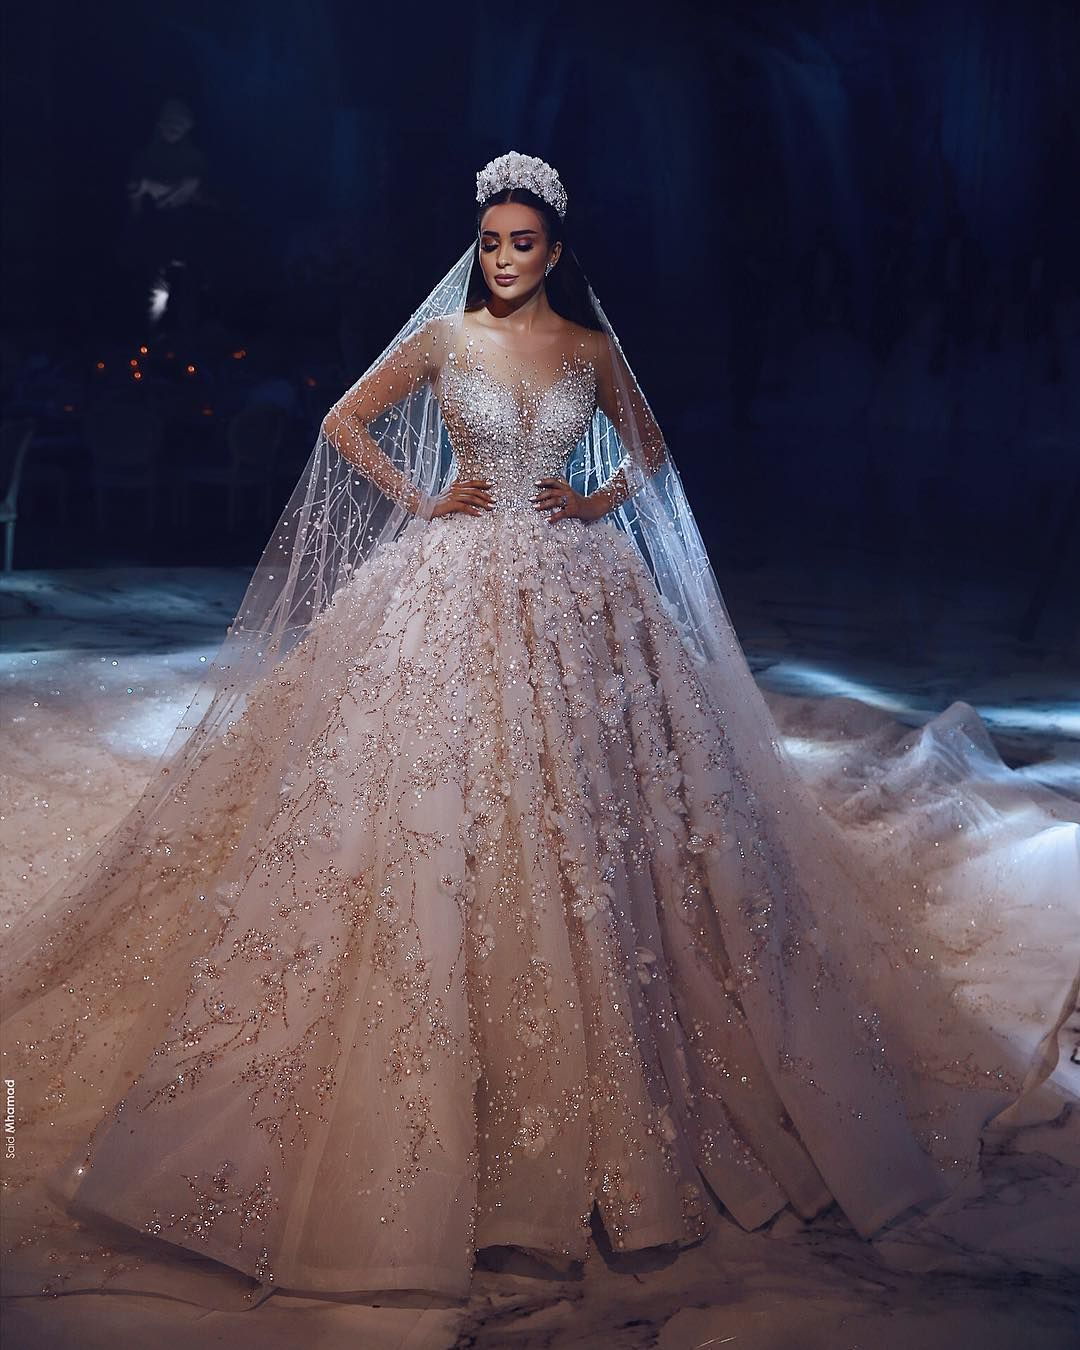 Photo of Vestidos de novia de lujo con mangas Una línea de vestidos de novia de encaje Kristal Número de modelo: BC0151